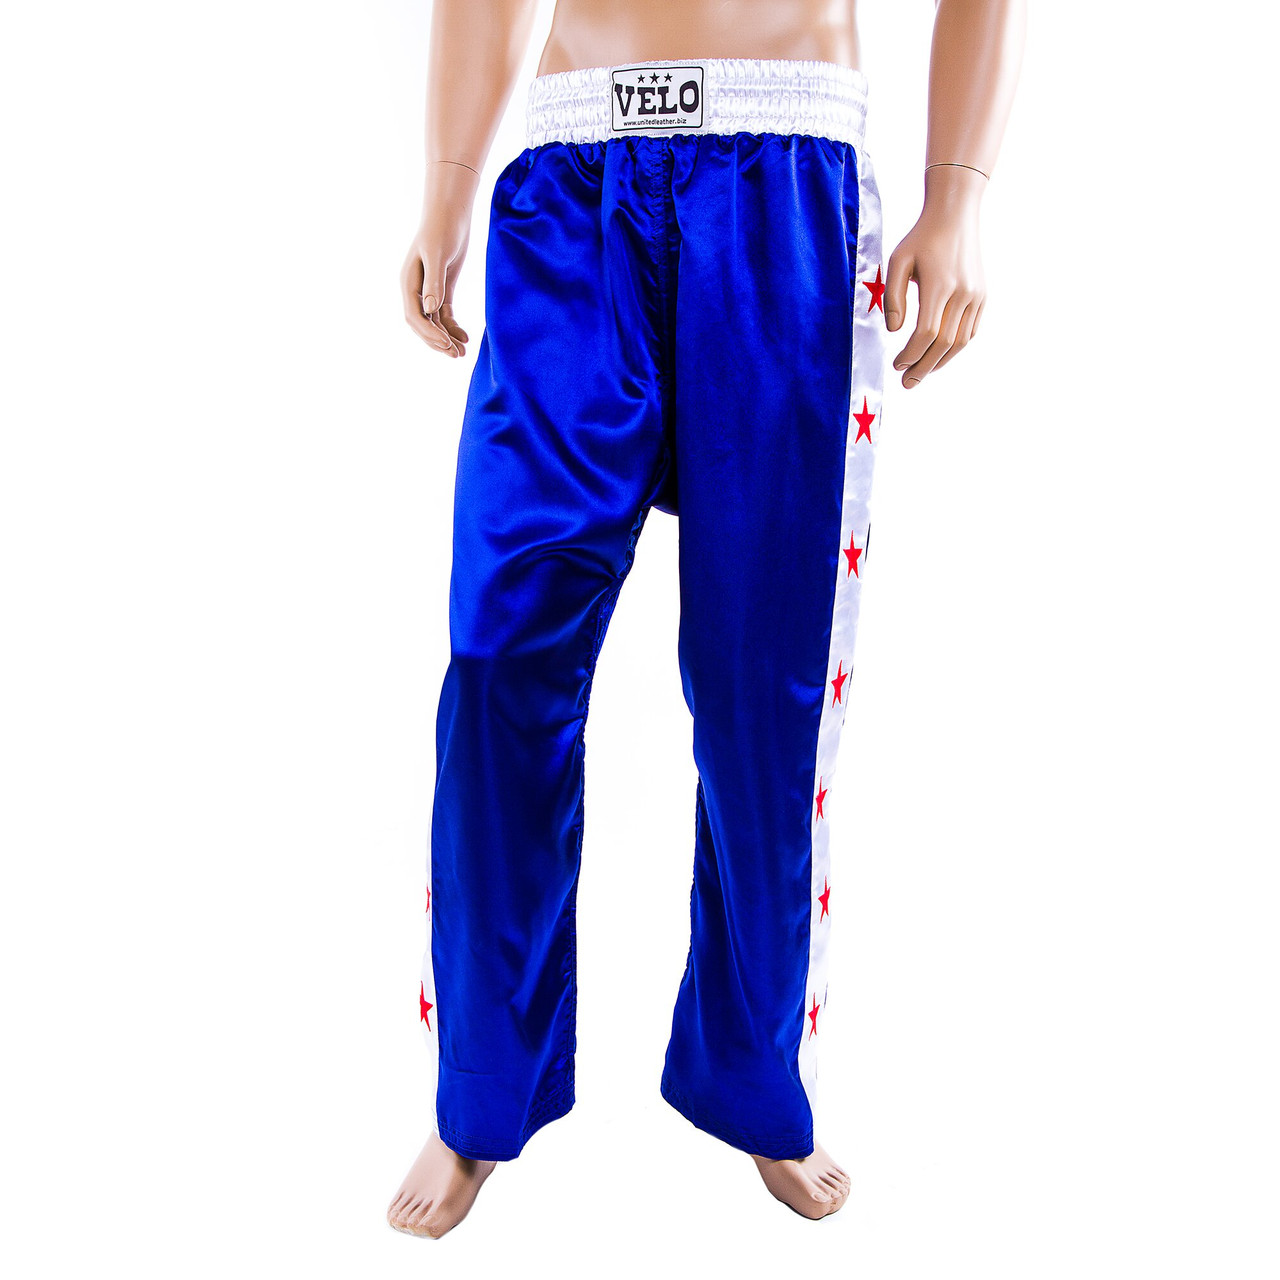 Брюки для кикбоксинга Velo синие 9016-L